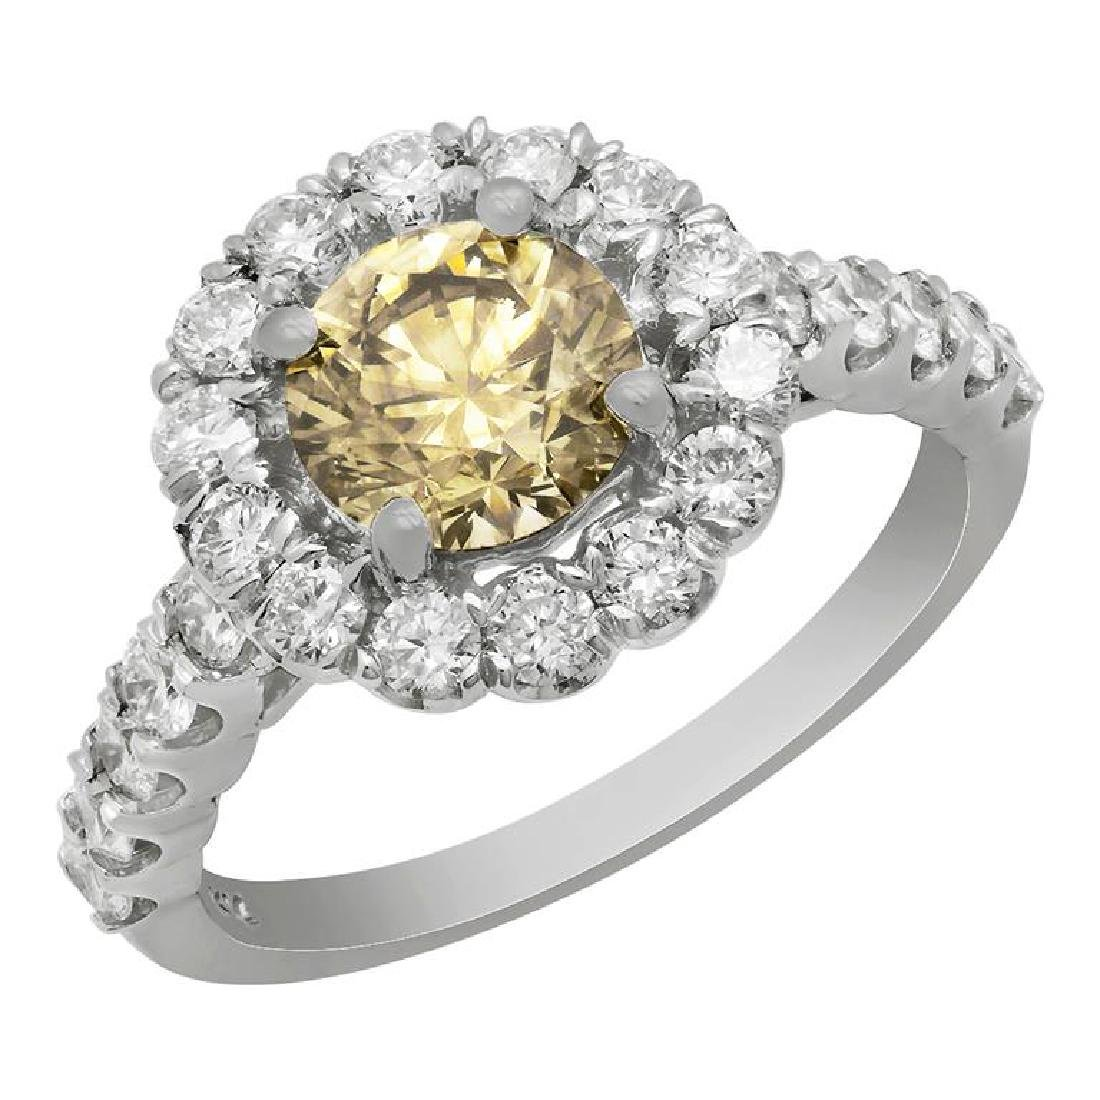 14k White Gold 1.31ct & 0.95ct Diamond Ring